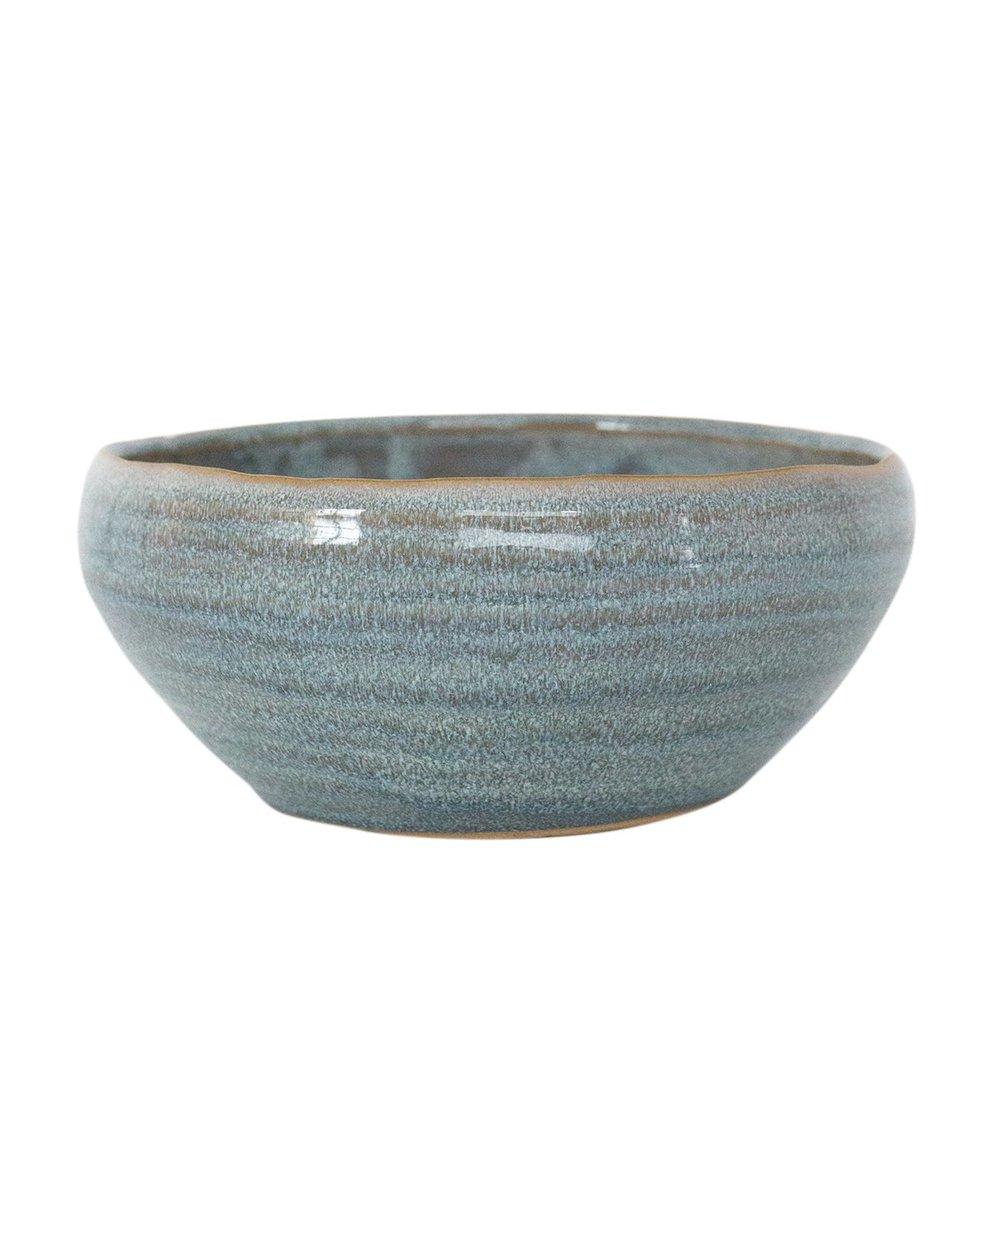 Blue_Glazed_Stoneware_Bowl_1.jpg